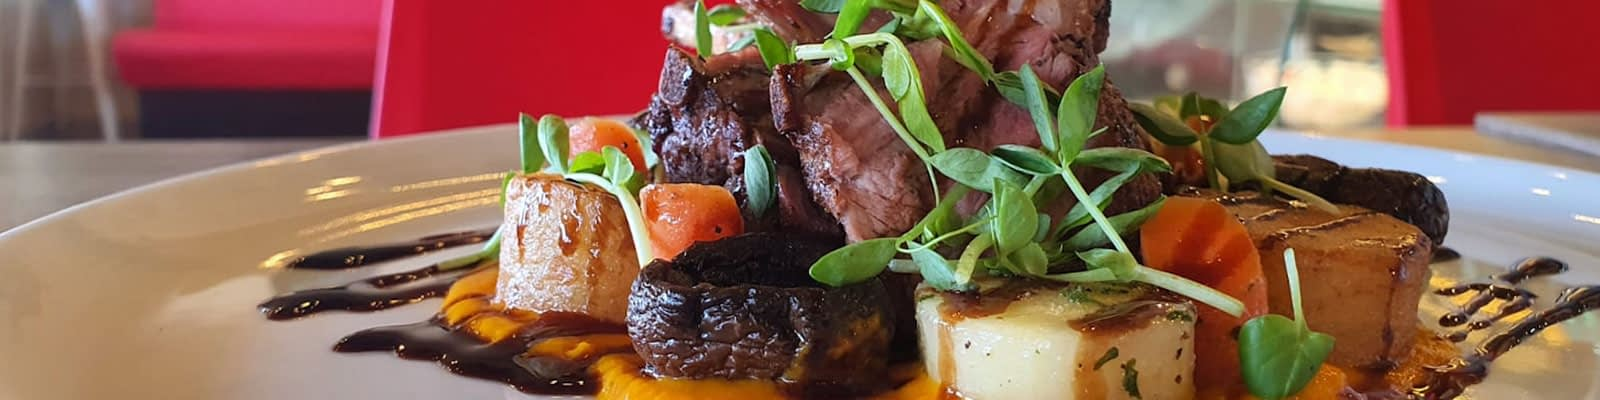 panino-restaurant-bonaire-slider-1